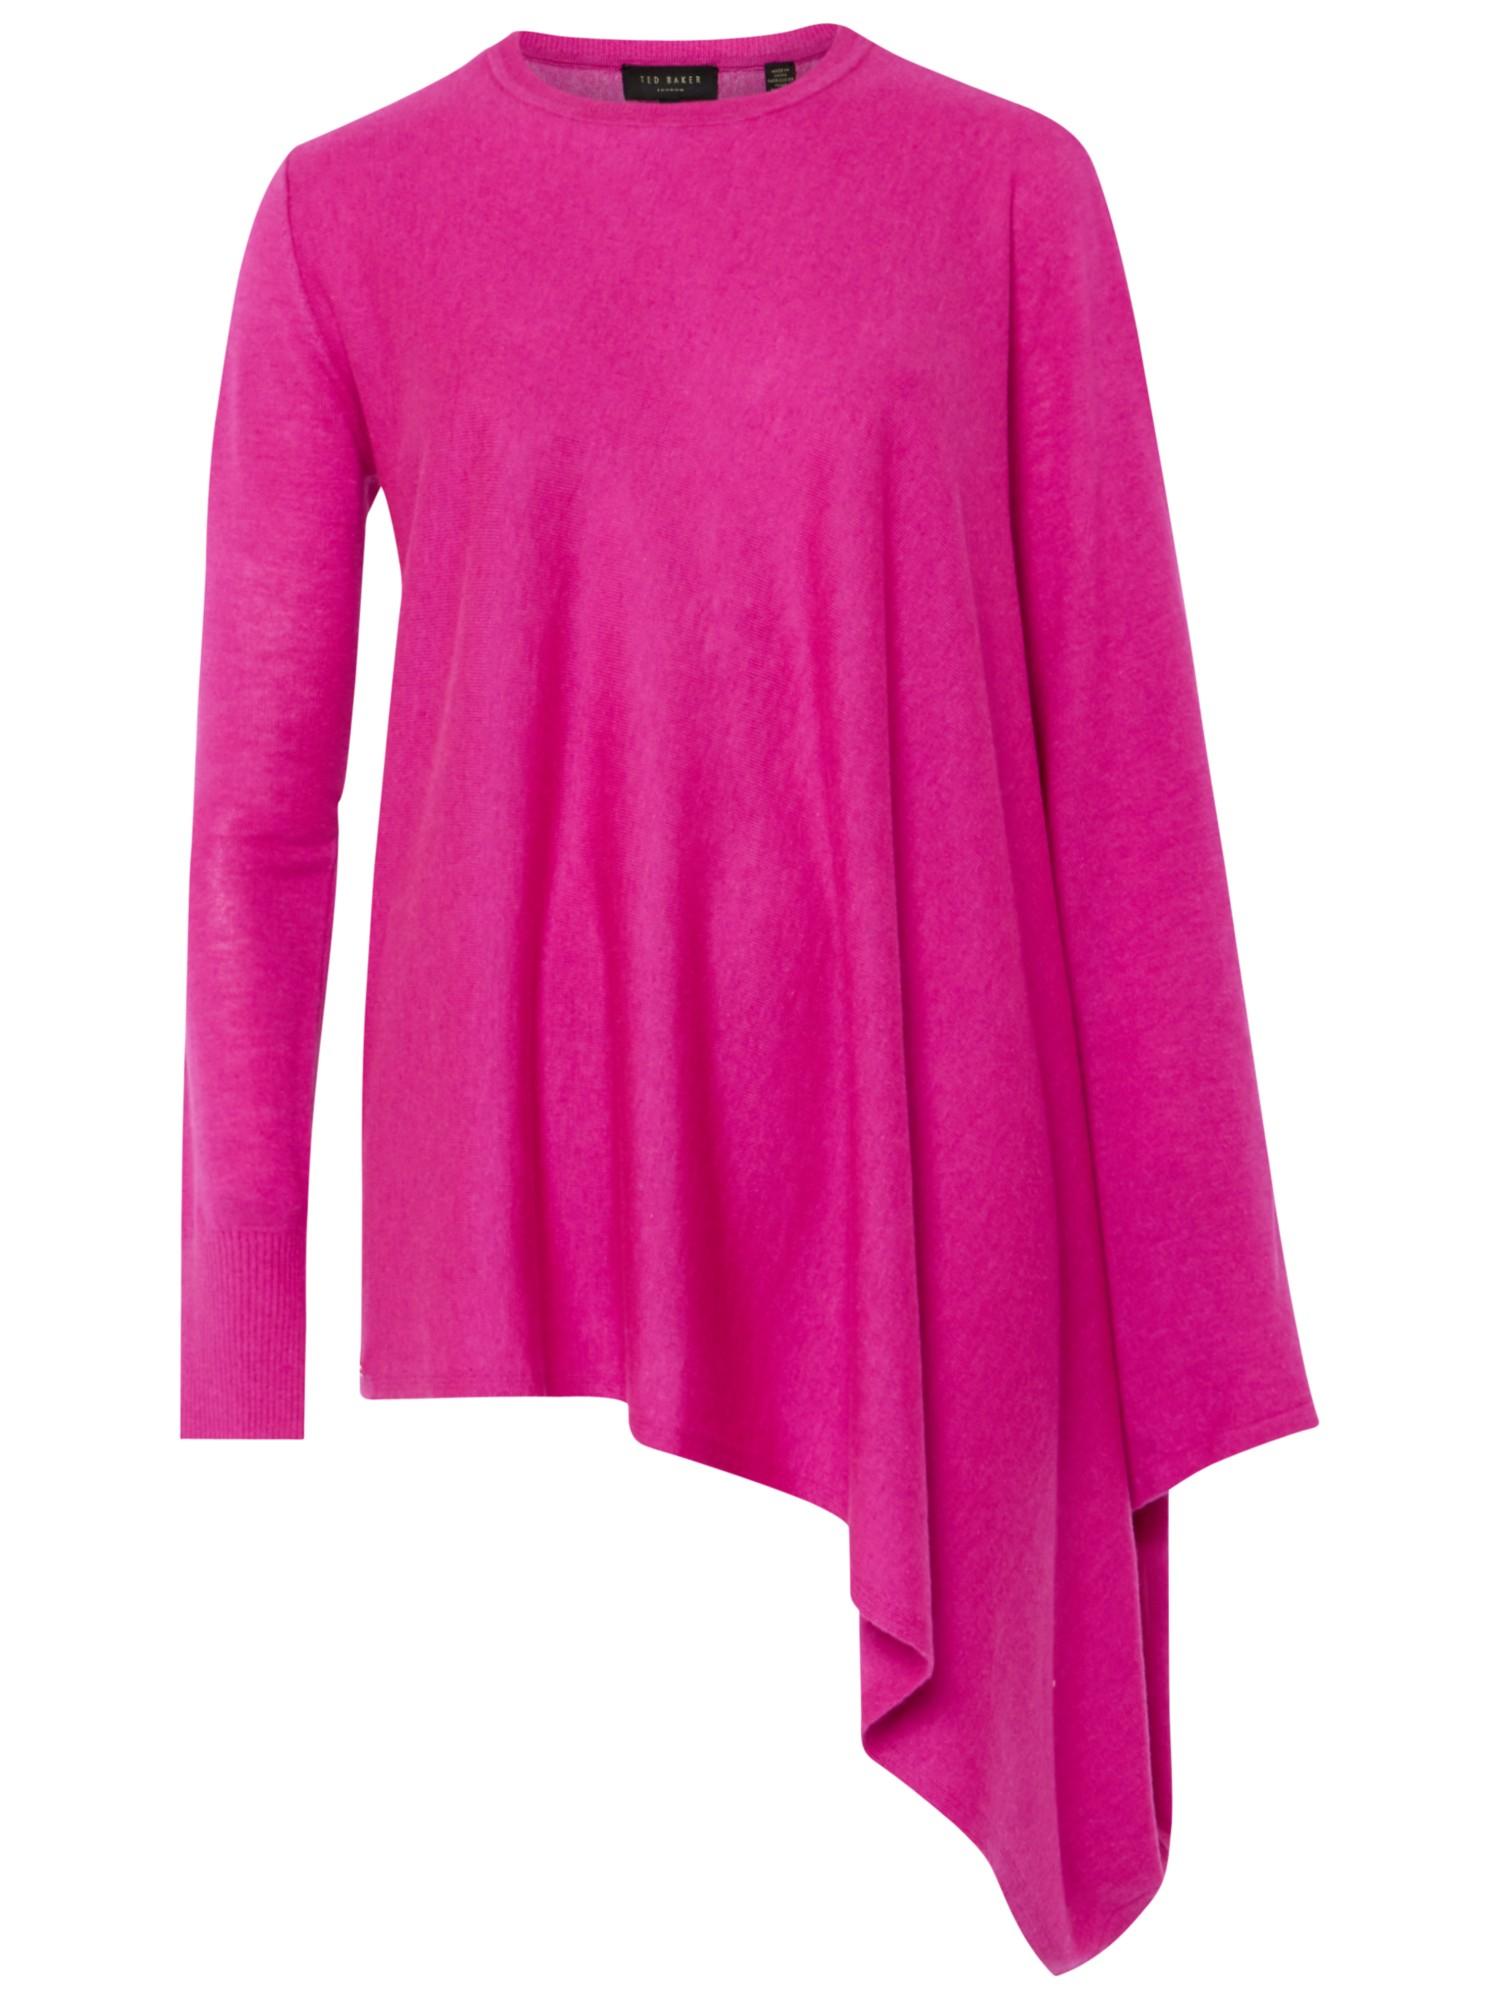 81bb47c5817f Ted Baker Janila Asymmetric Hem Jumper in Pink - Lyst